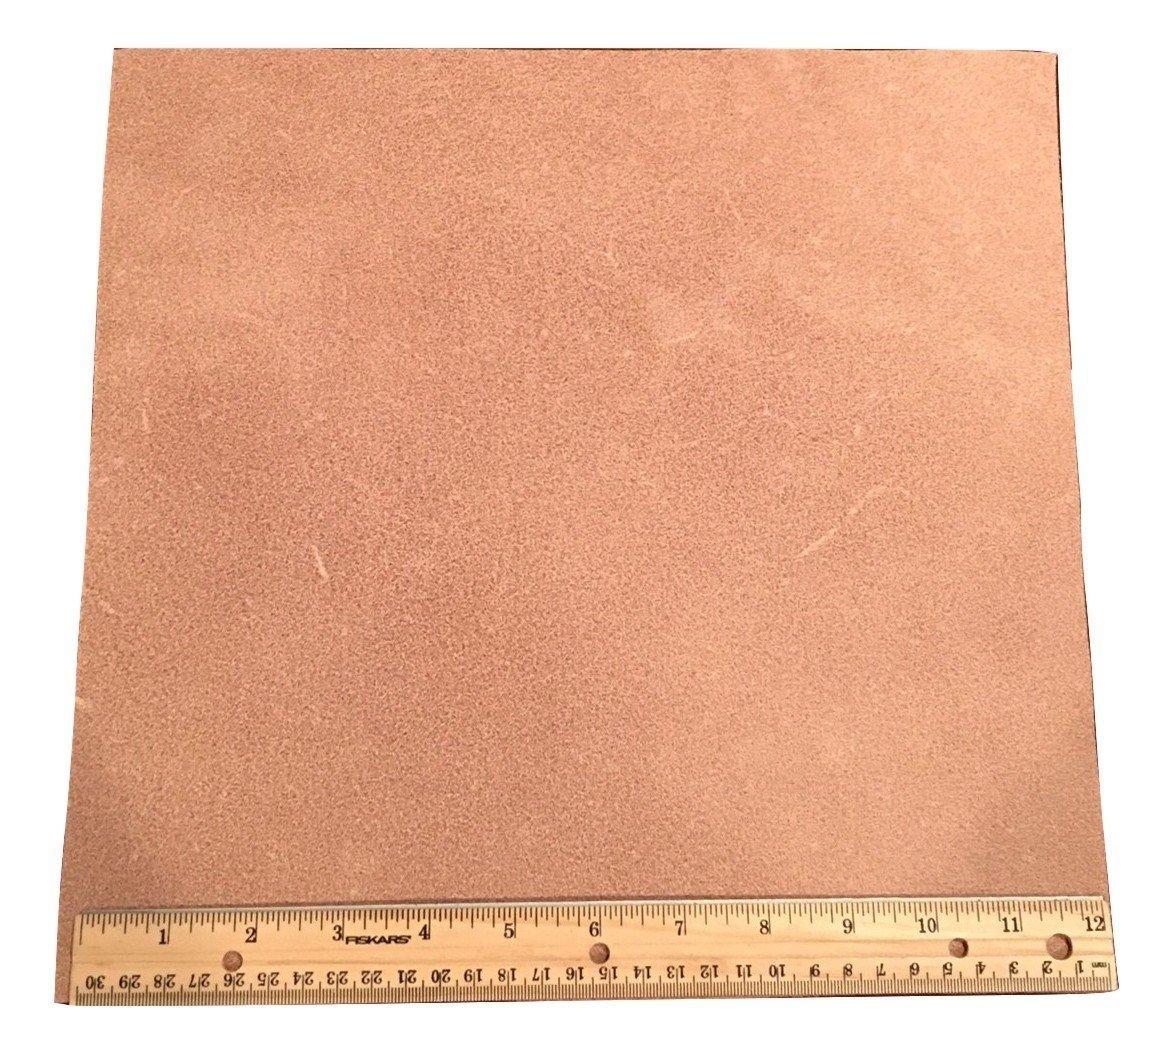 Dangerous Threads Leather Side Veg Tan Splits - Medium Weight- 20 SF